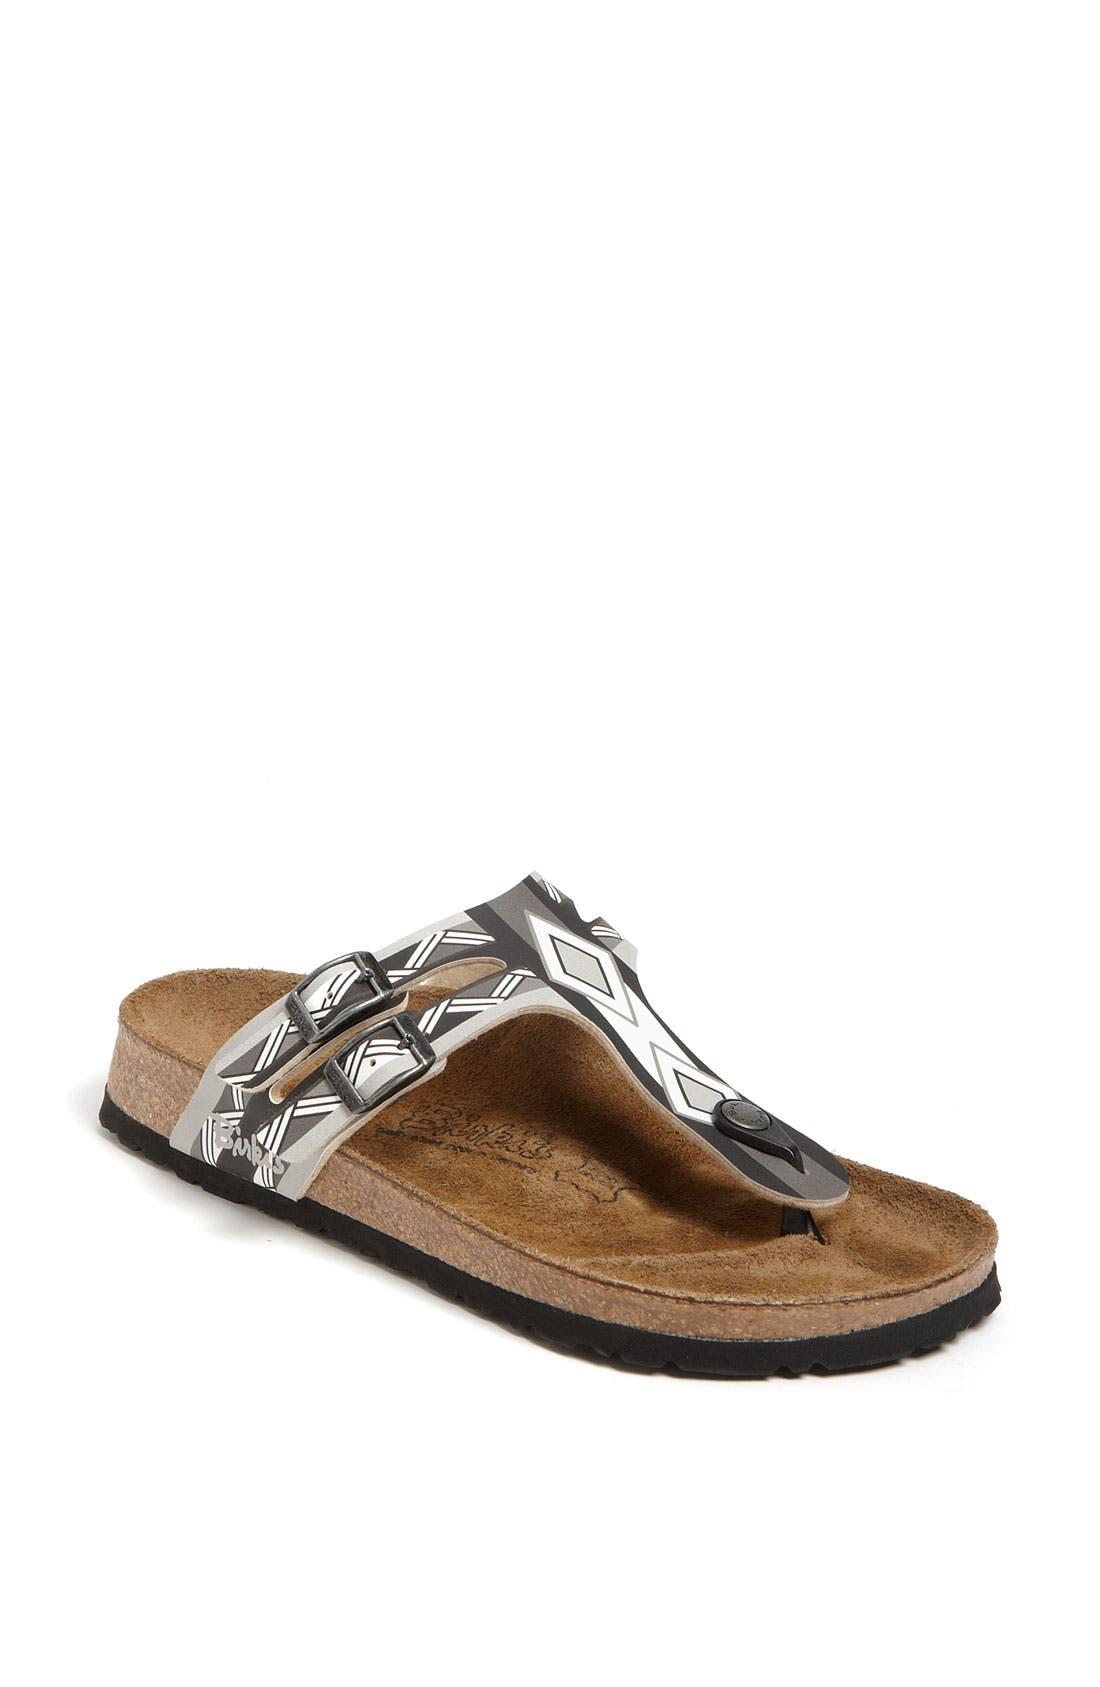 Main Image - Birki's® 'Milos' Sandal